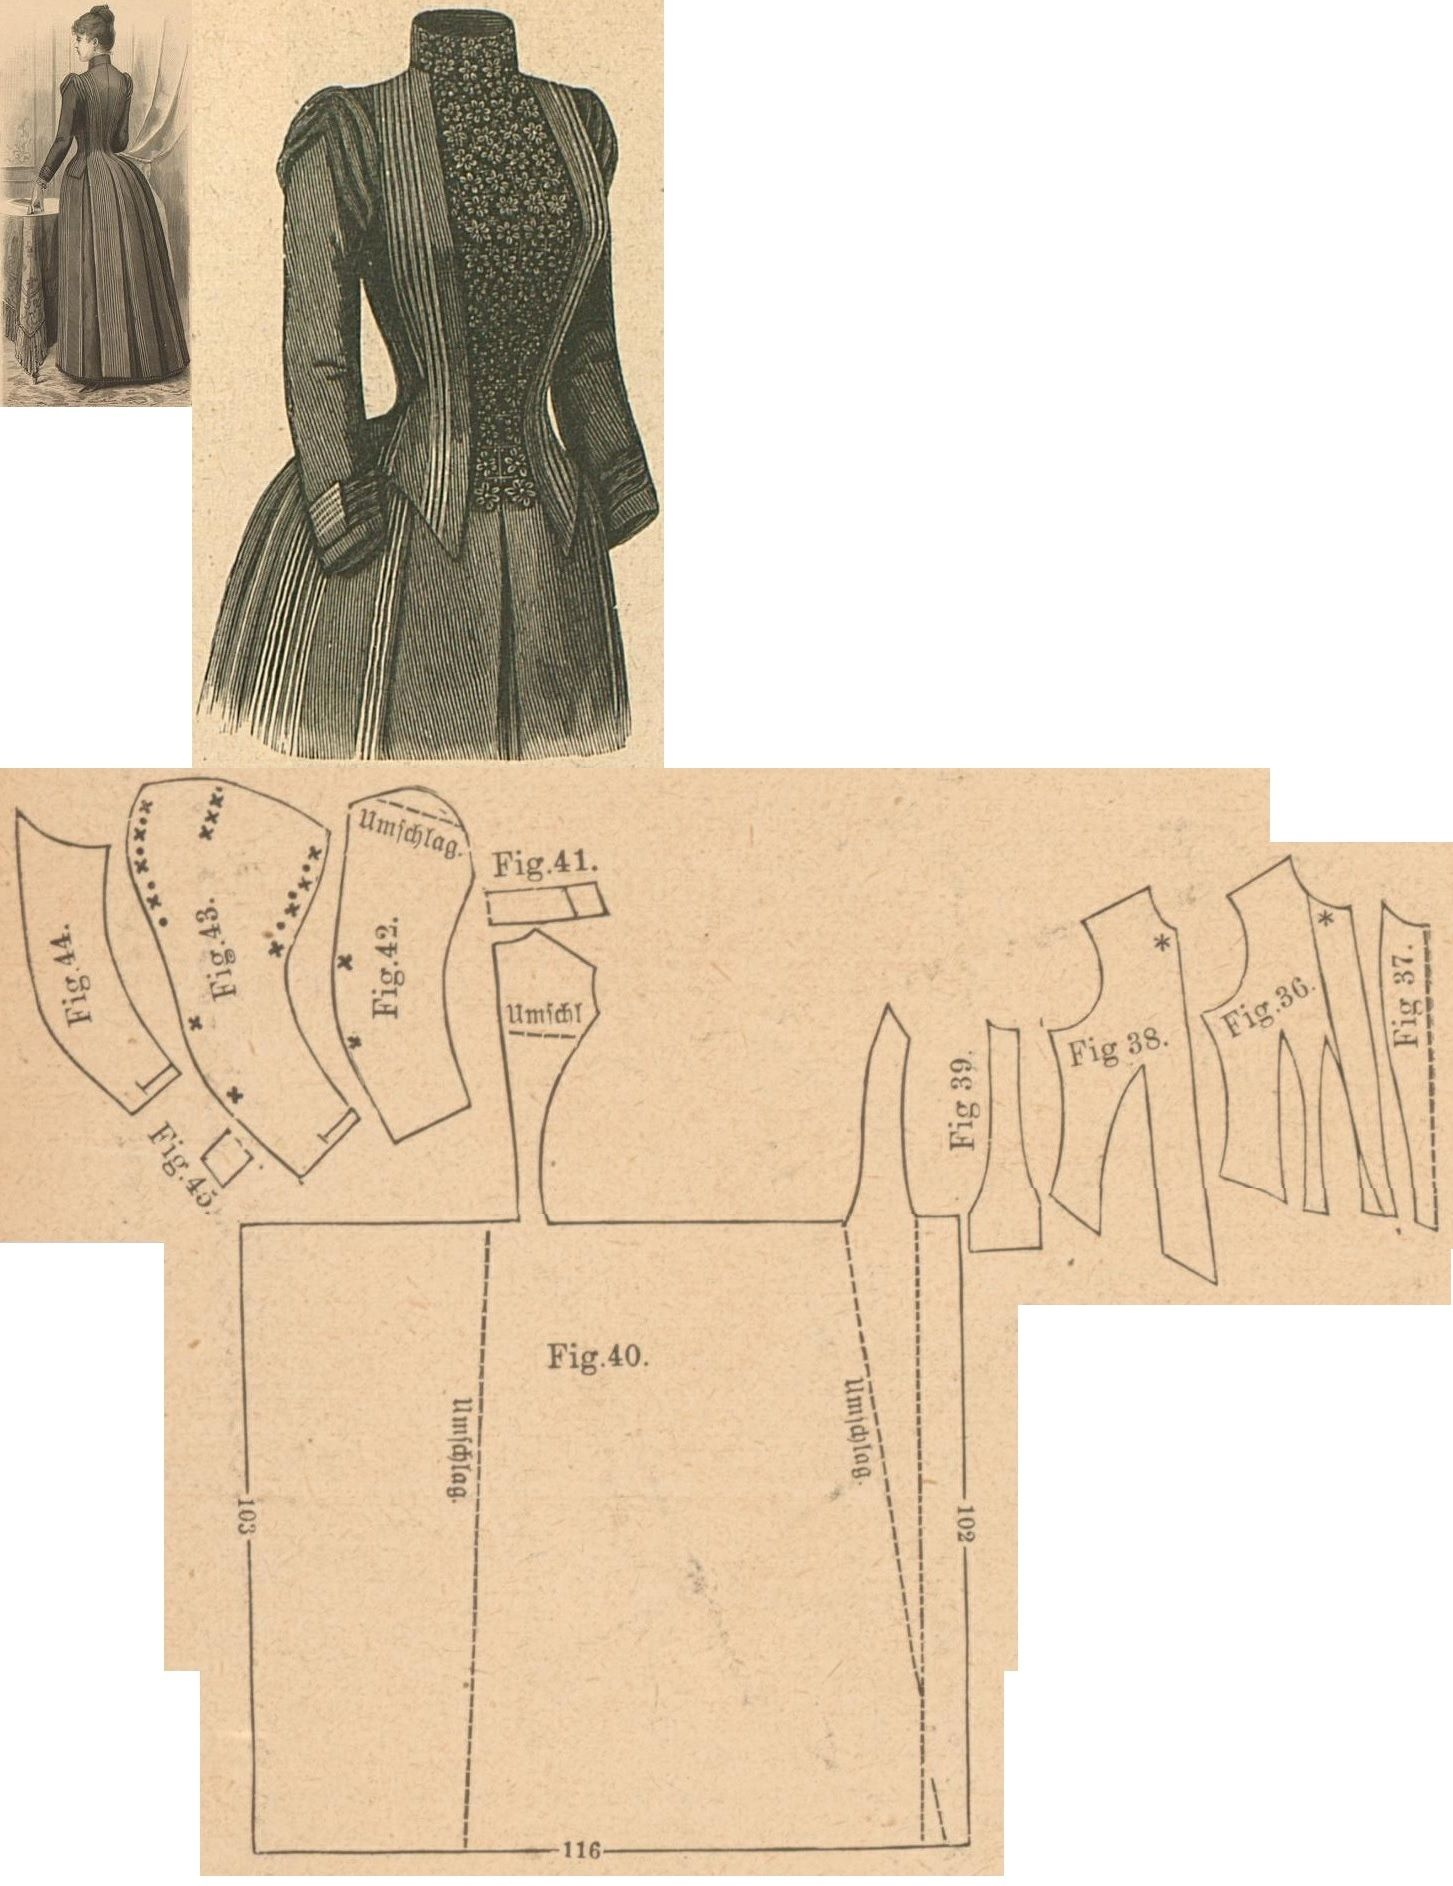 Der Bazar 1888: Slate-grey woollen dress; 36. bodice's lining front part, 37. plastron in half size, 38. overbodice part, 39. side gore, 40. back part in half size, 41. collar in half size, 42. and 43. oversleeve's lining and pouffy outer part, 44. undersleeve part, 45. cuff in half size